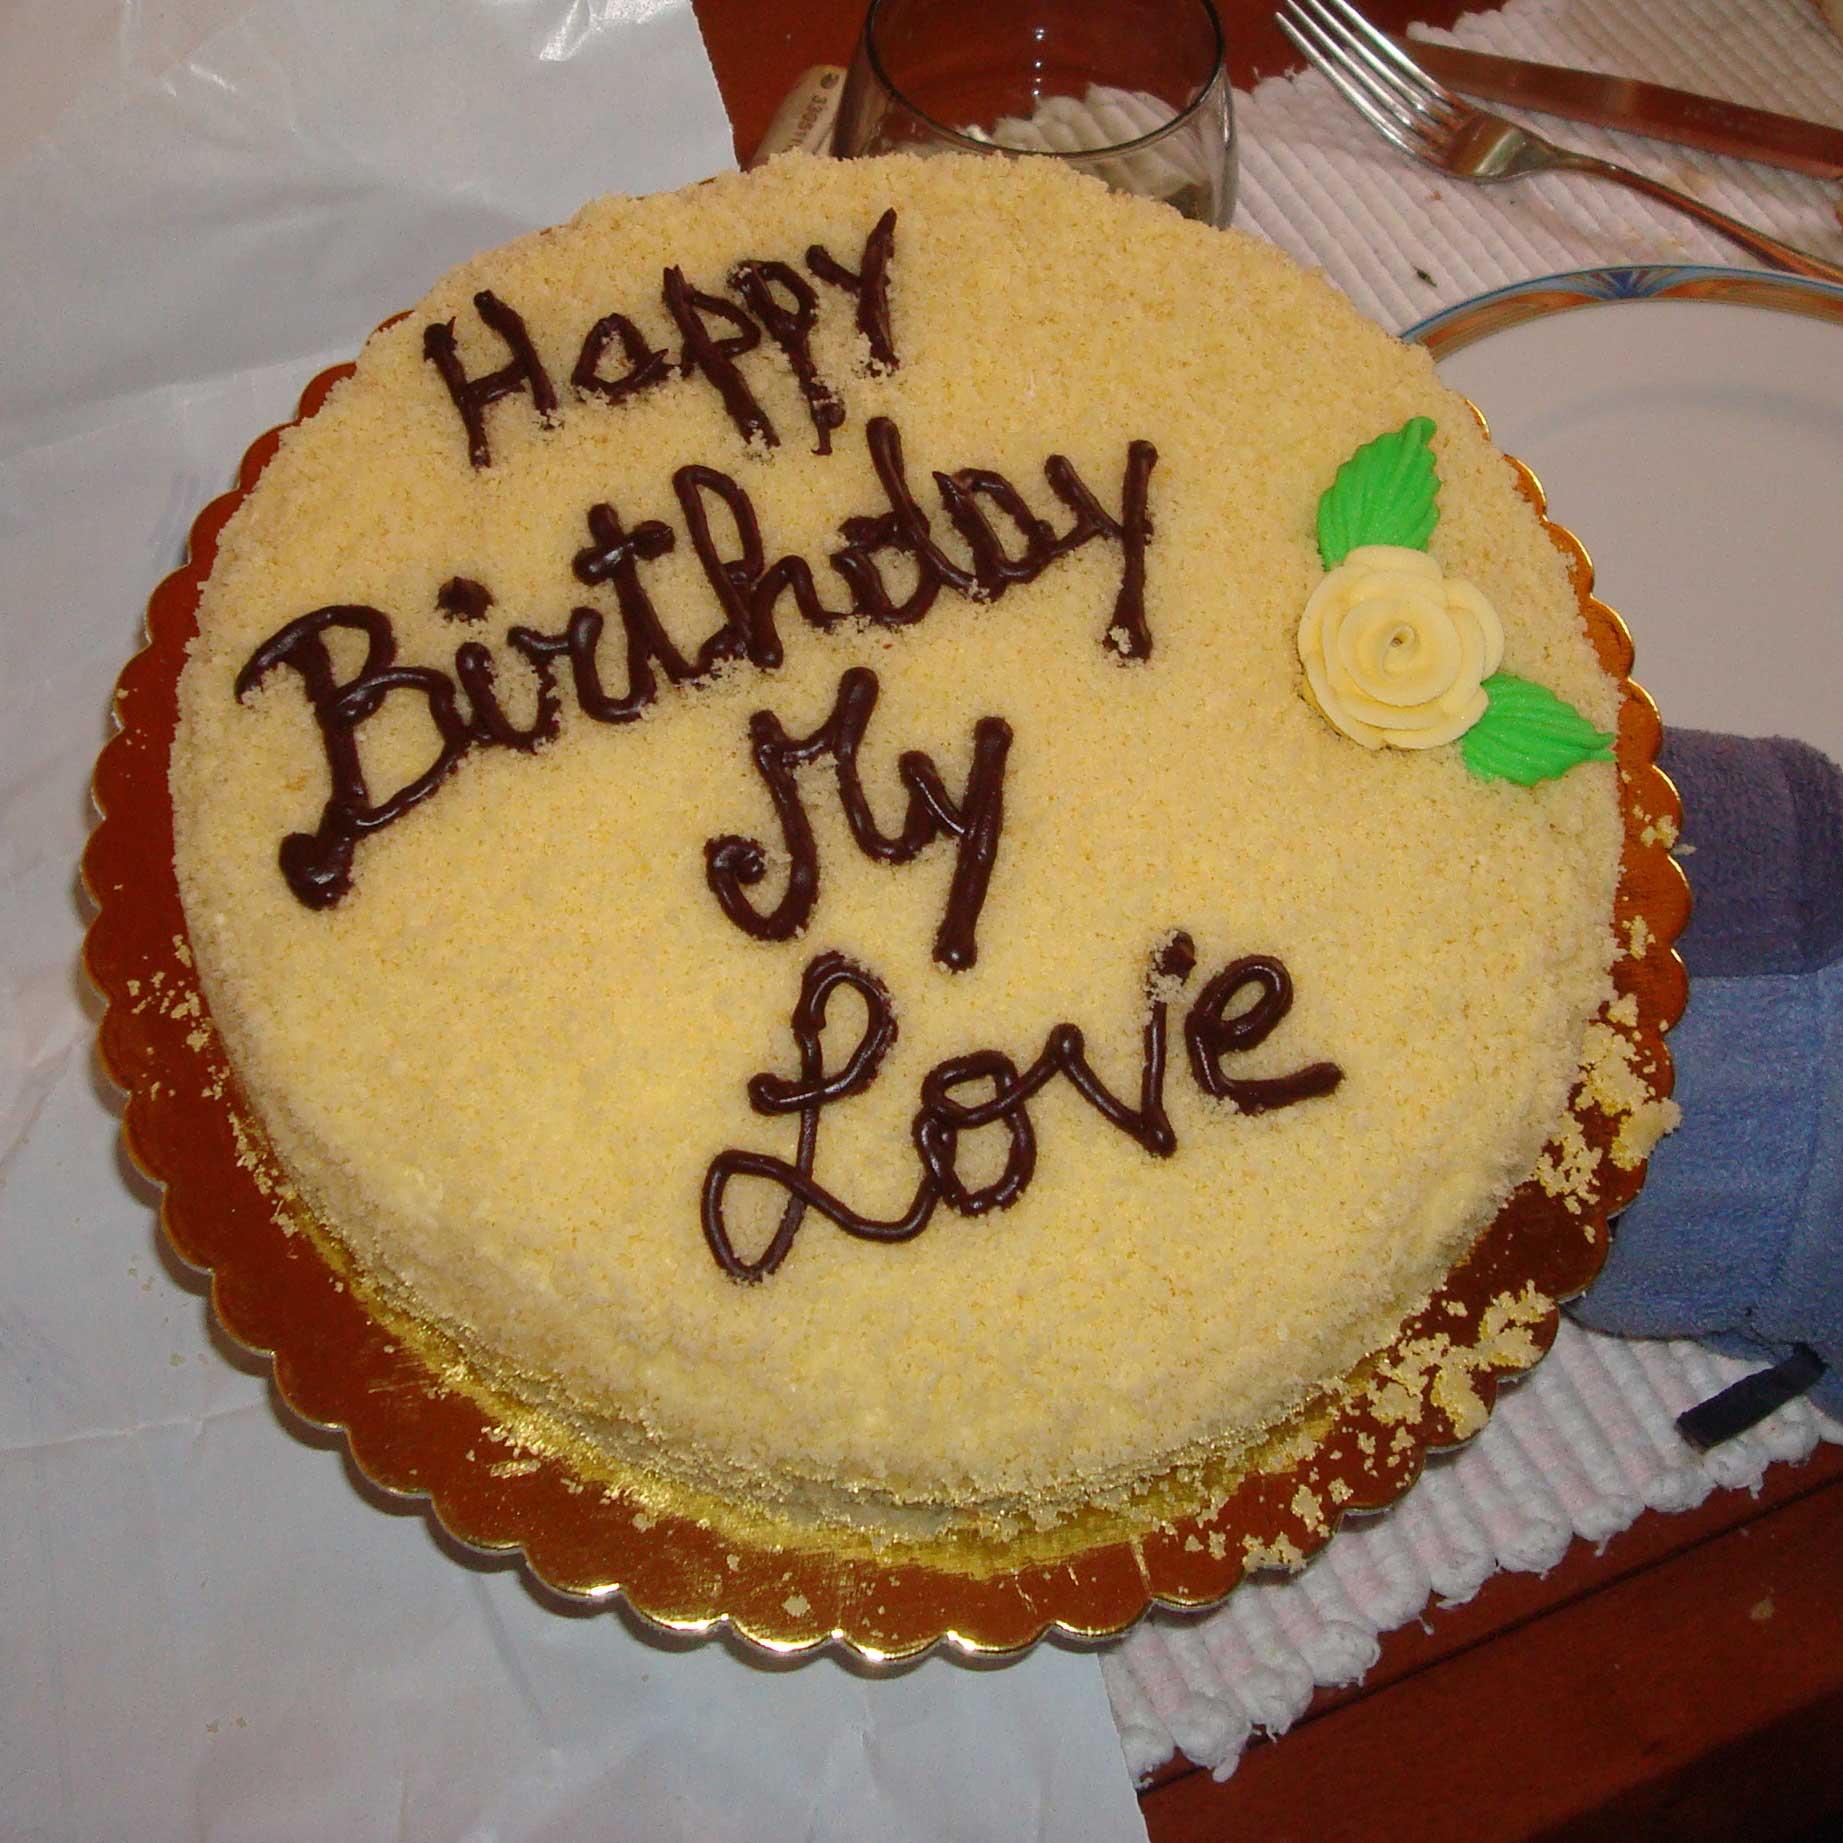 Happy Birthday My Love Chocolate Cake | www.pixshark.com ...